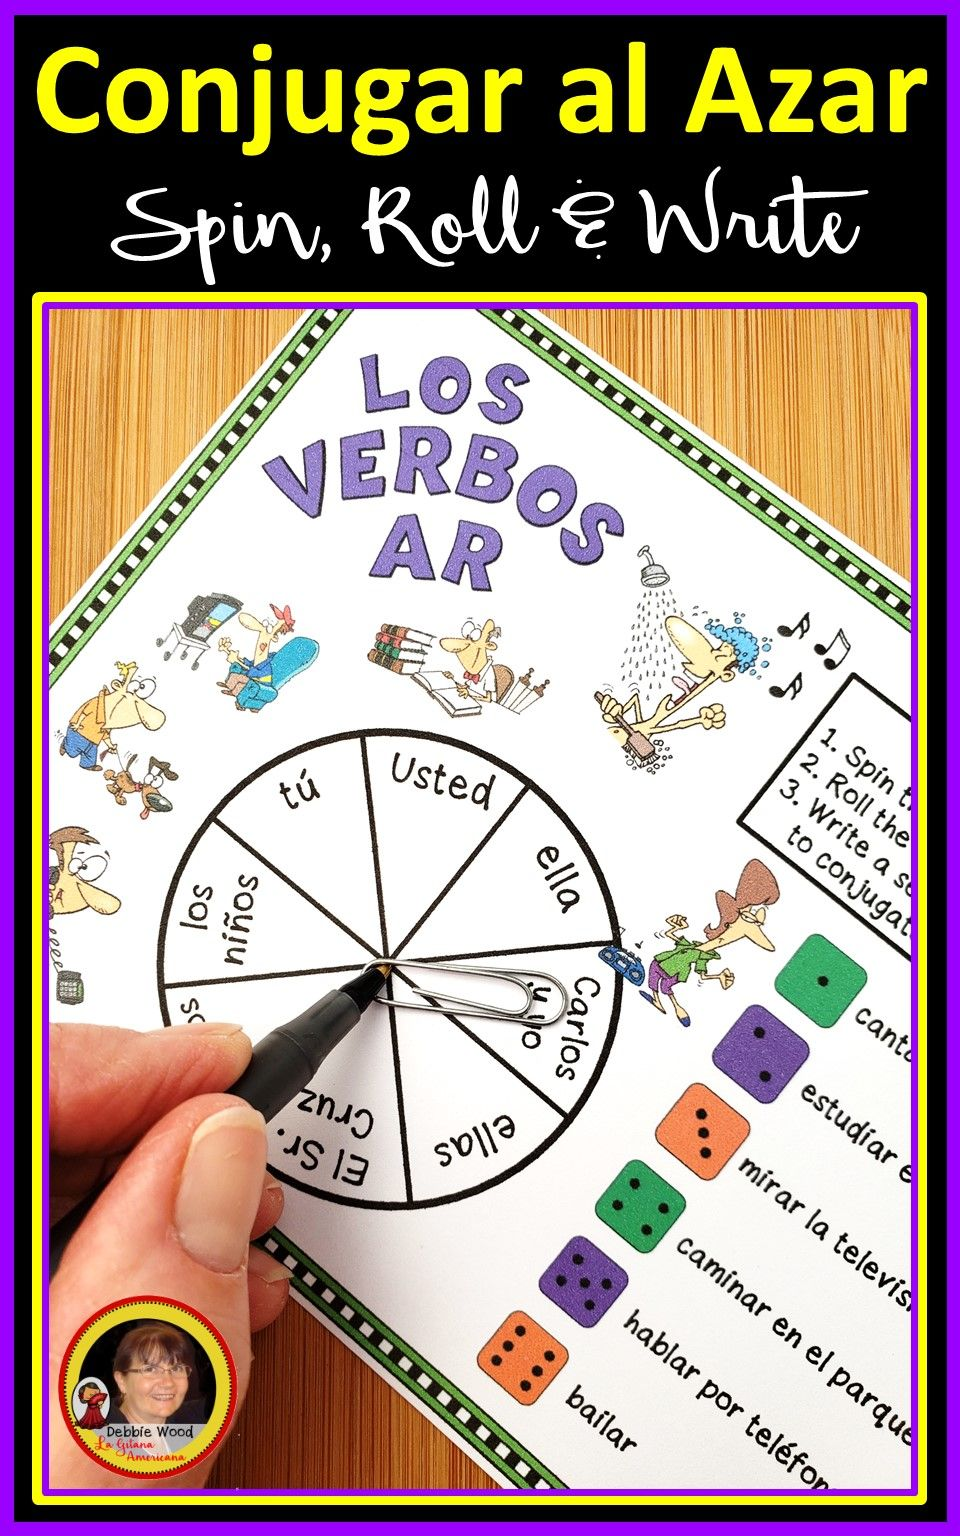 Spanish Present Tense Verbs Spanish Teaching Resources Spanish Language Learning Spanish Verbs [ 1536 x 960 Pixel ]